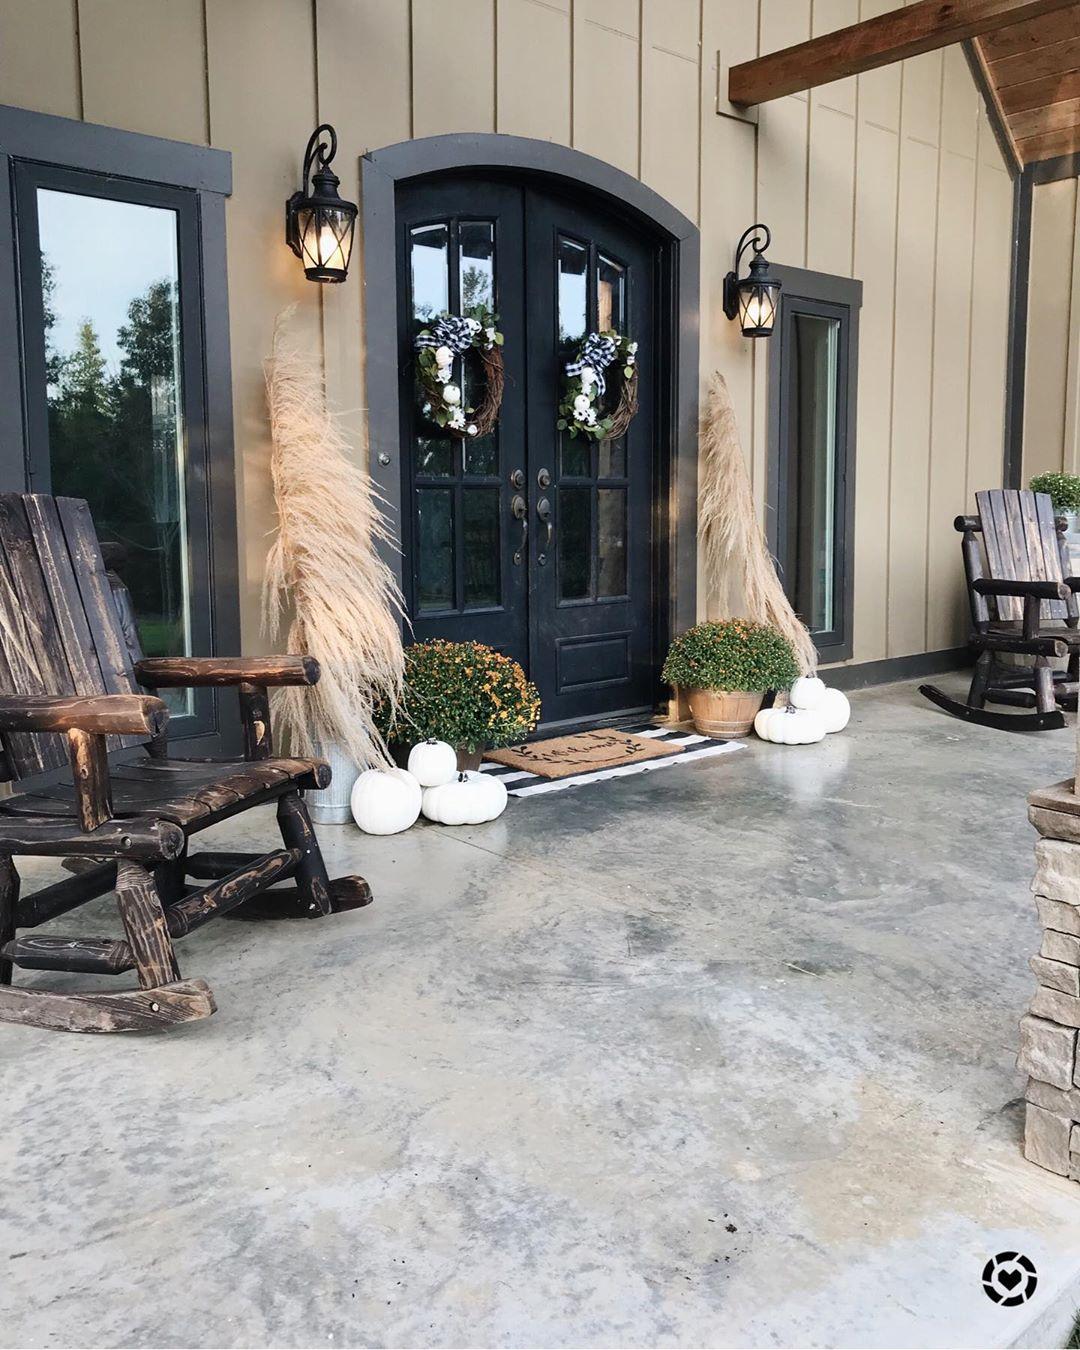 Fabulous Toned-Down Fall Porch Decor